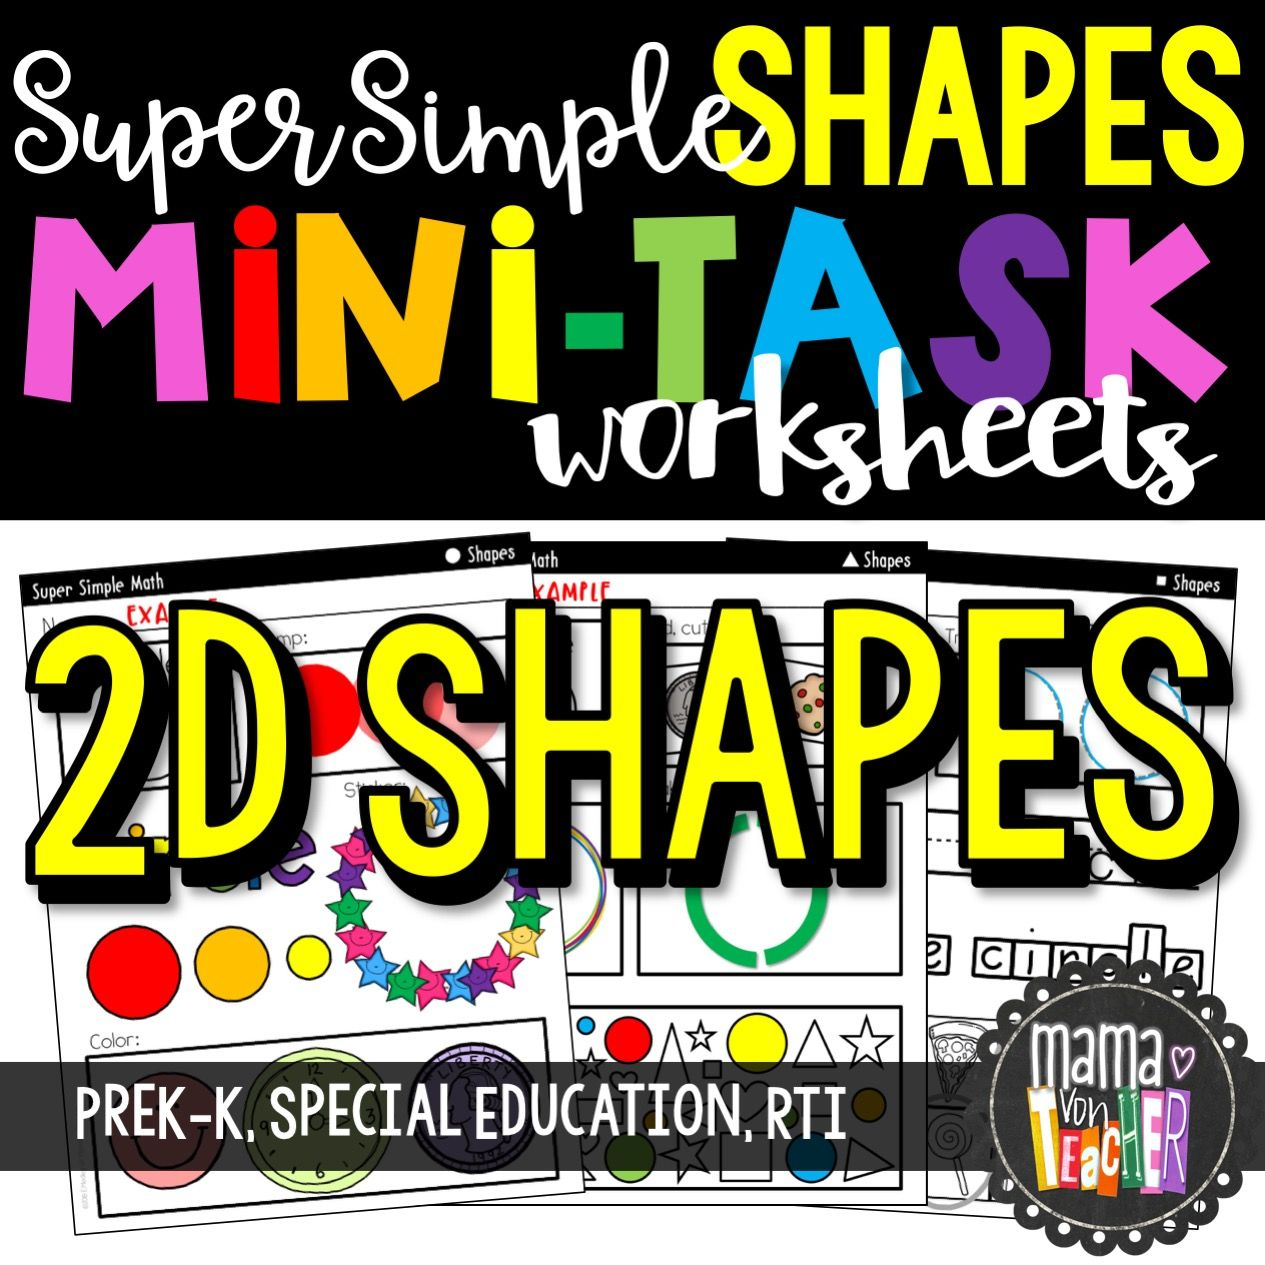 Super Simple Math Shape Worksheets 2d Shapes No Prep